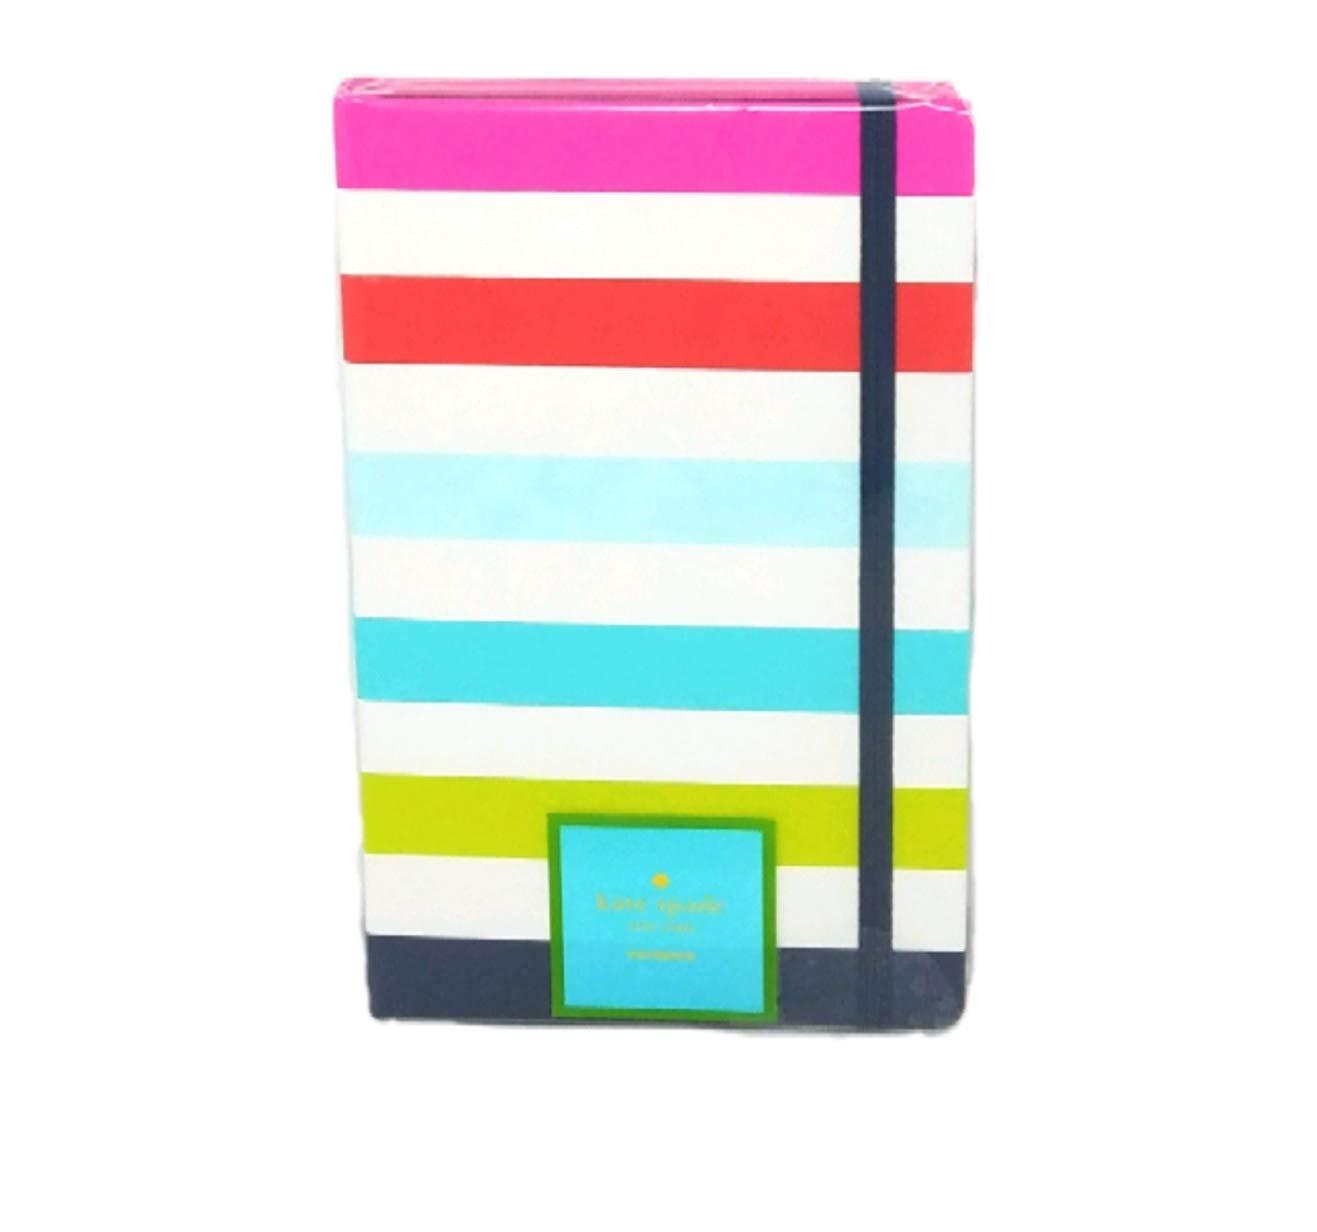 Kate Spade Take Note Large Notebook,Candy Stripe